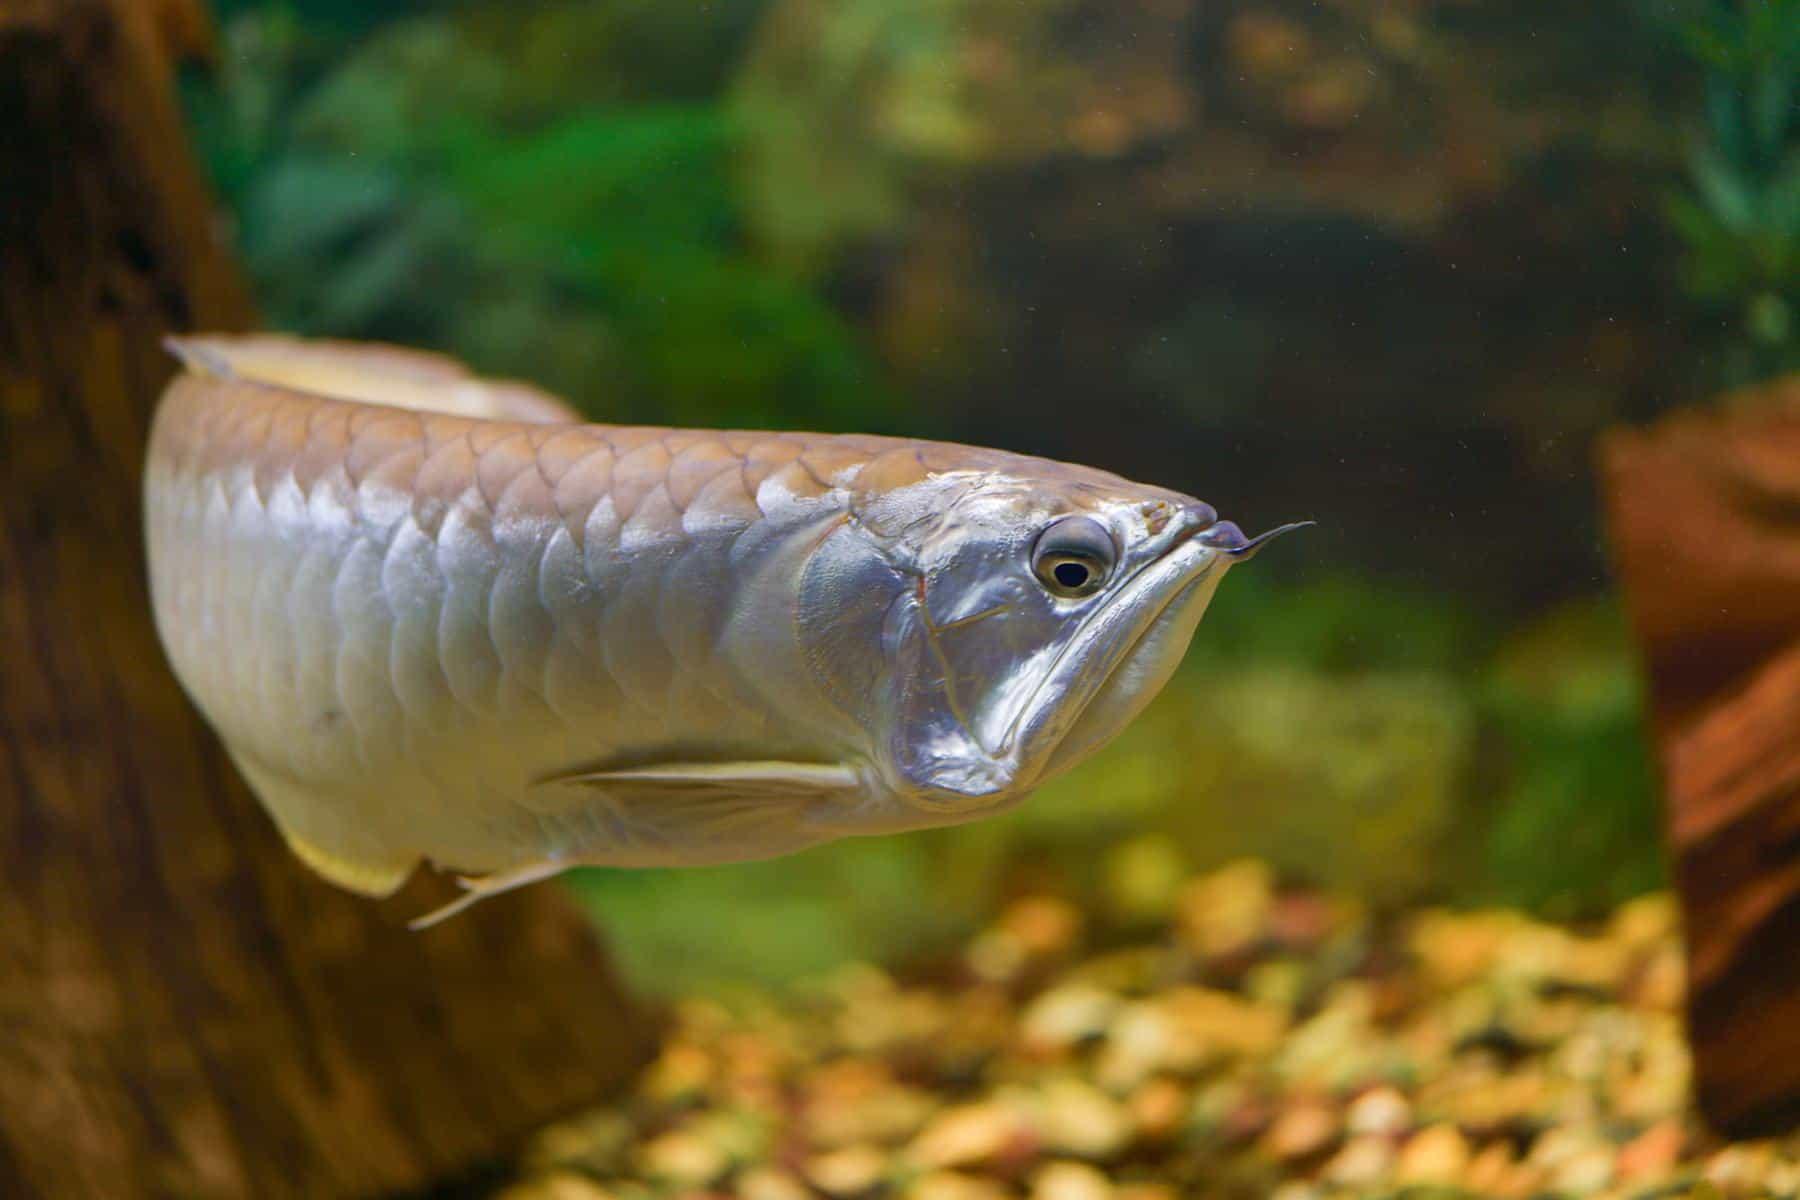 silver arowana fish swimming alone in tank